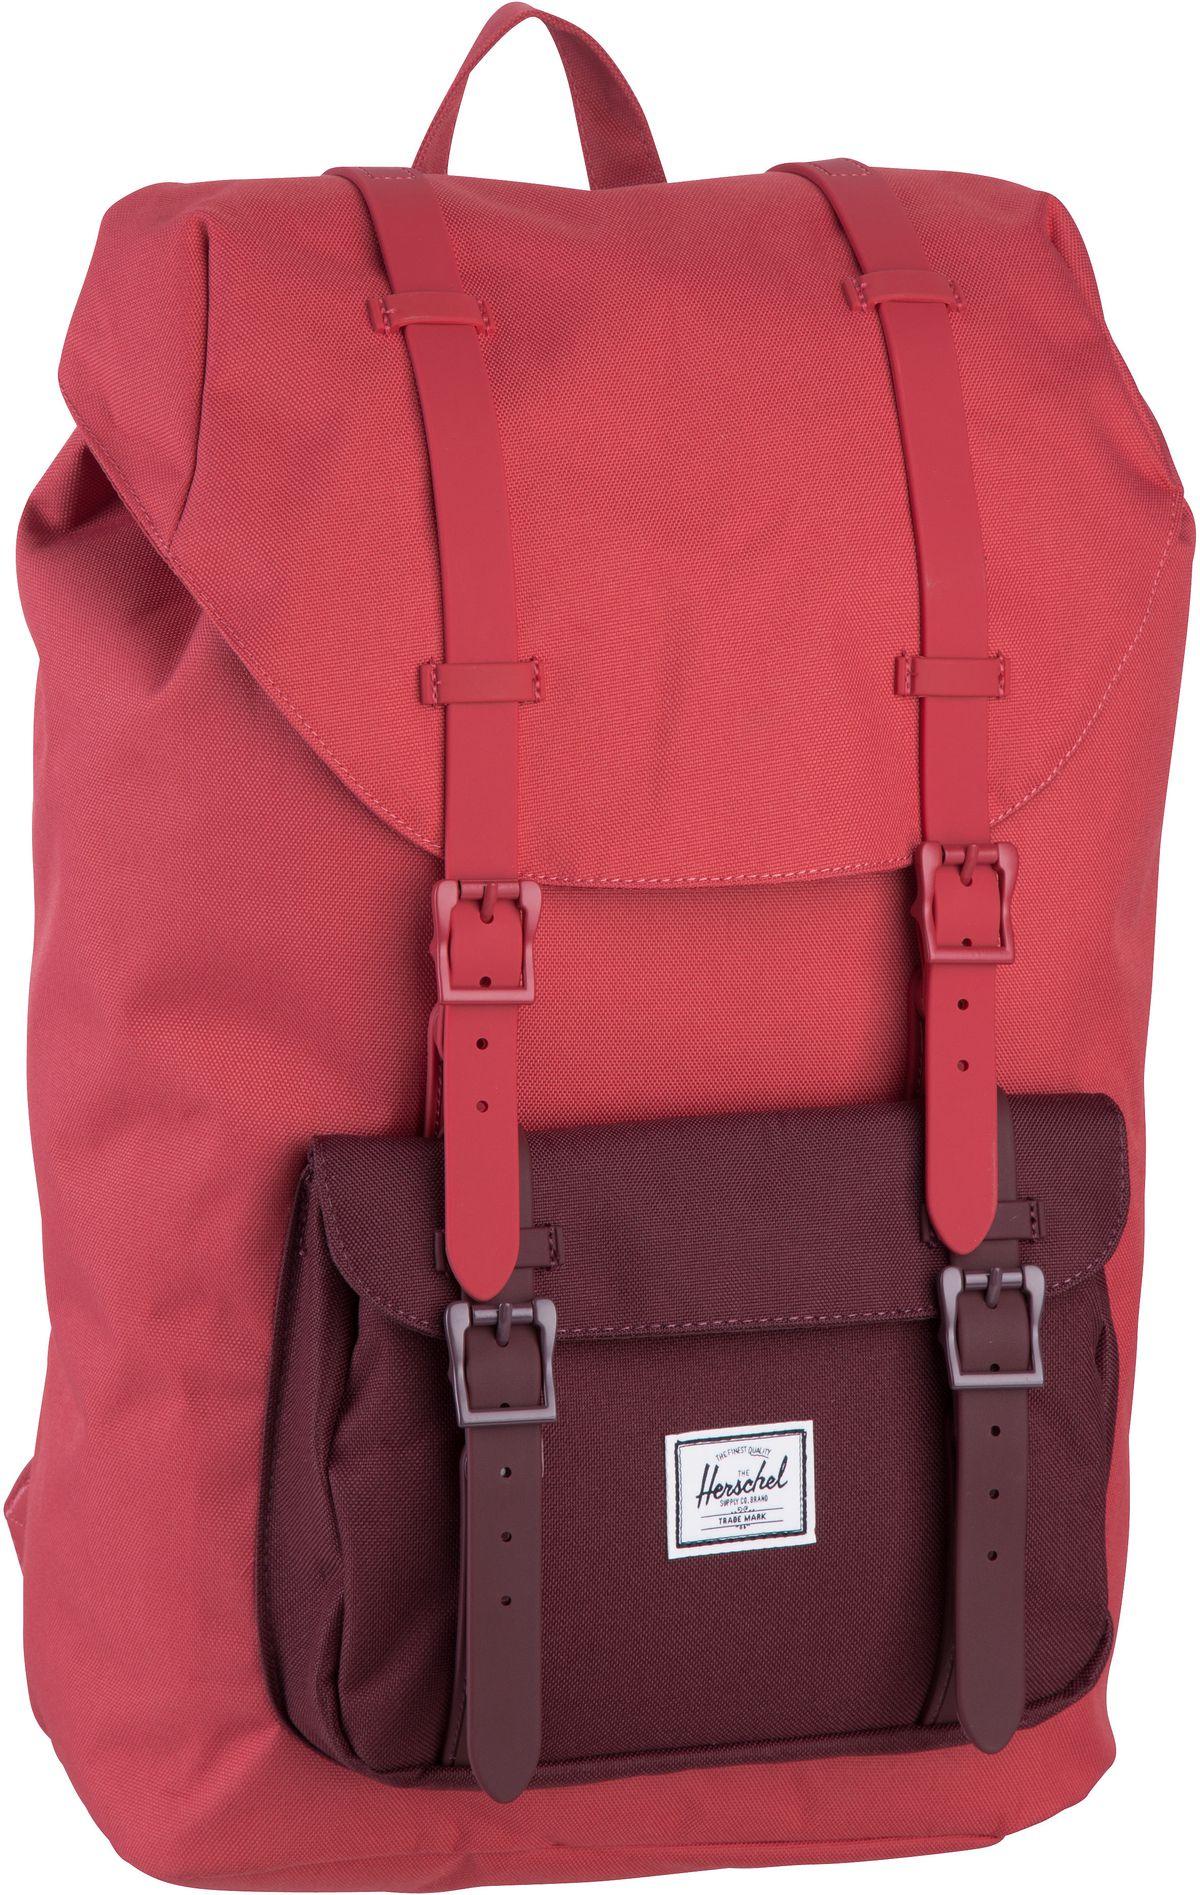 Laptoprucksack Little America Mid Volume Mineral Red/Plum (16.5 Liter)